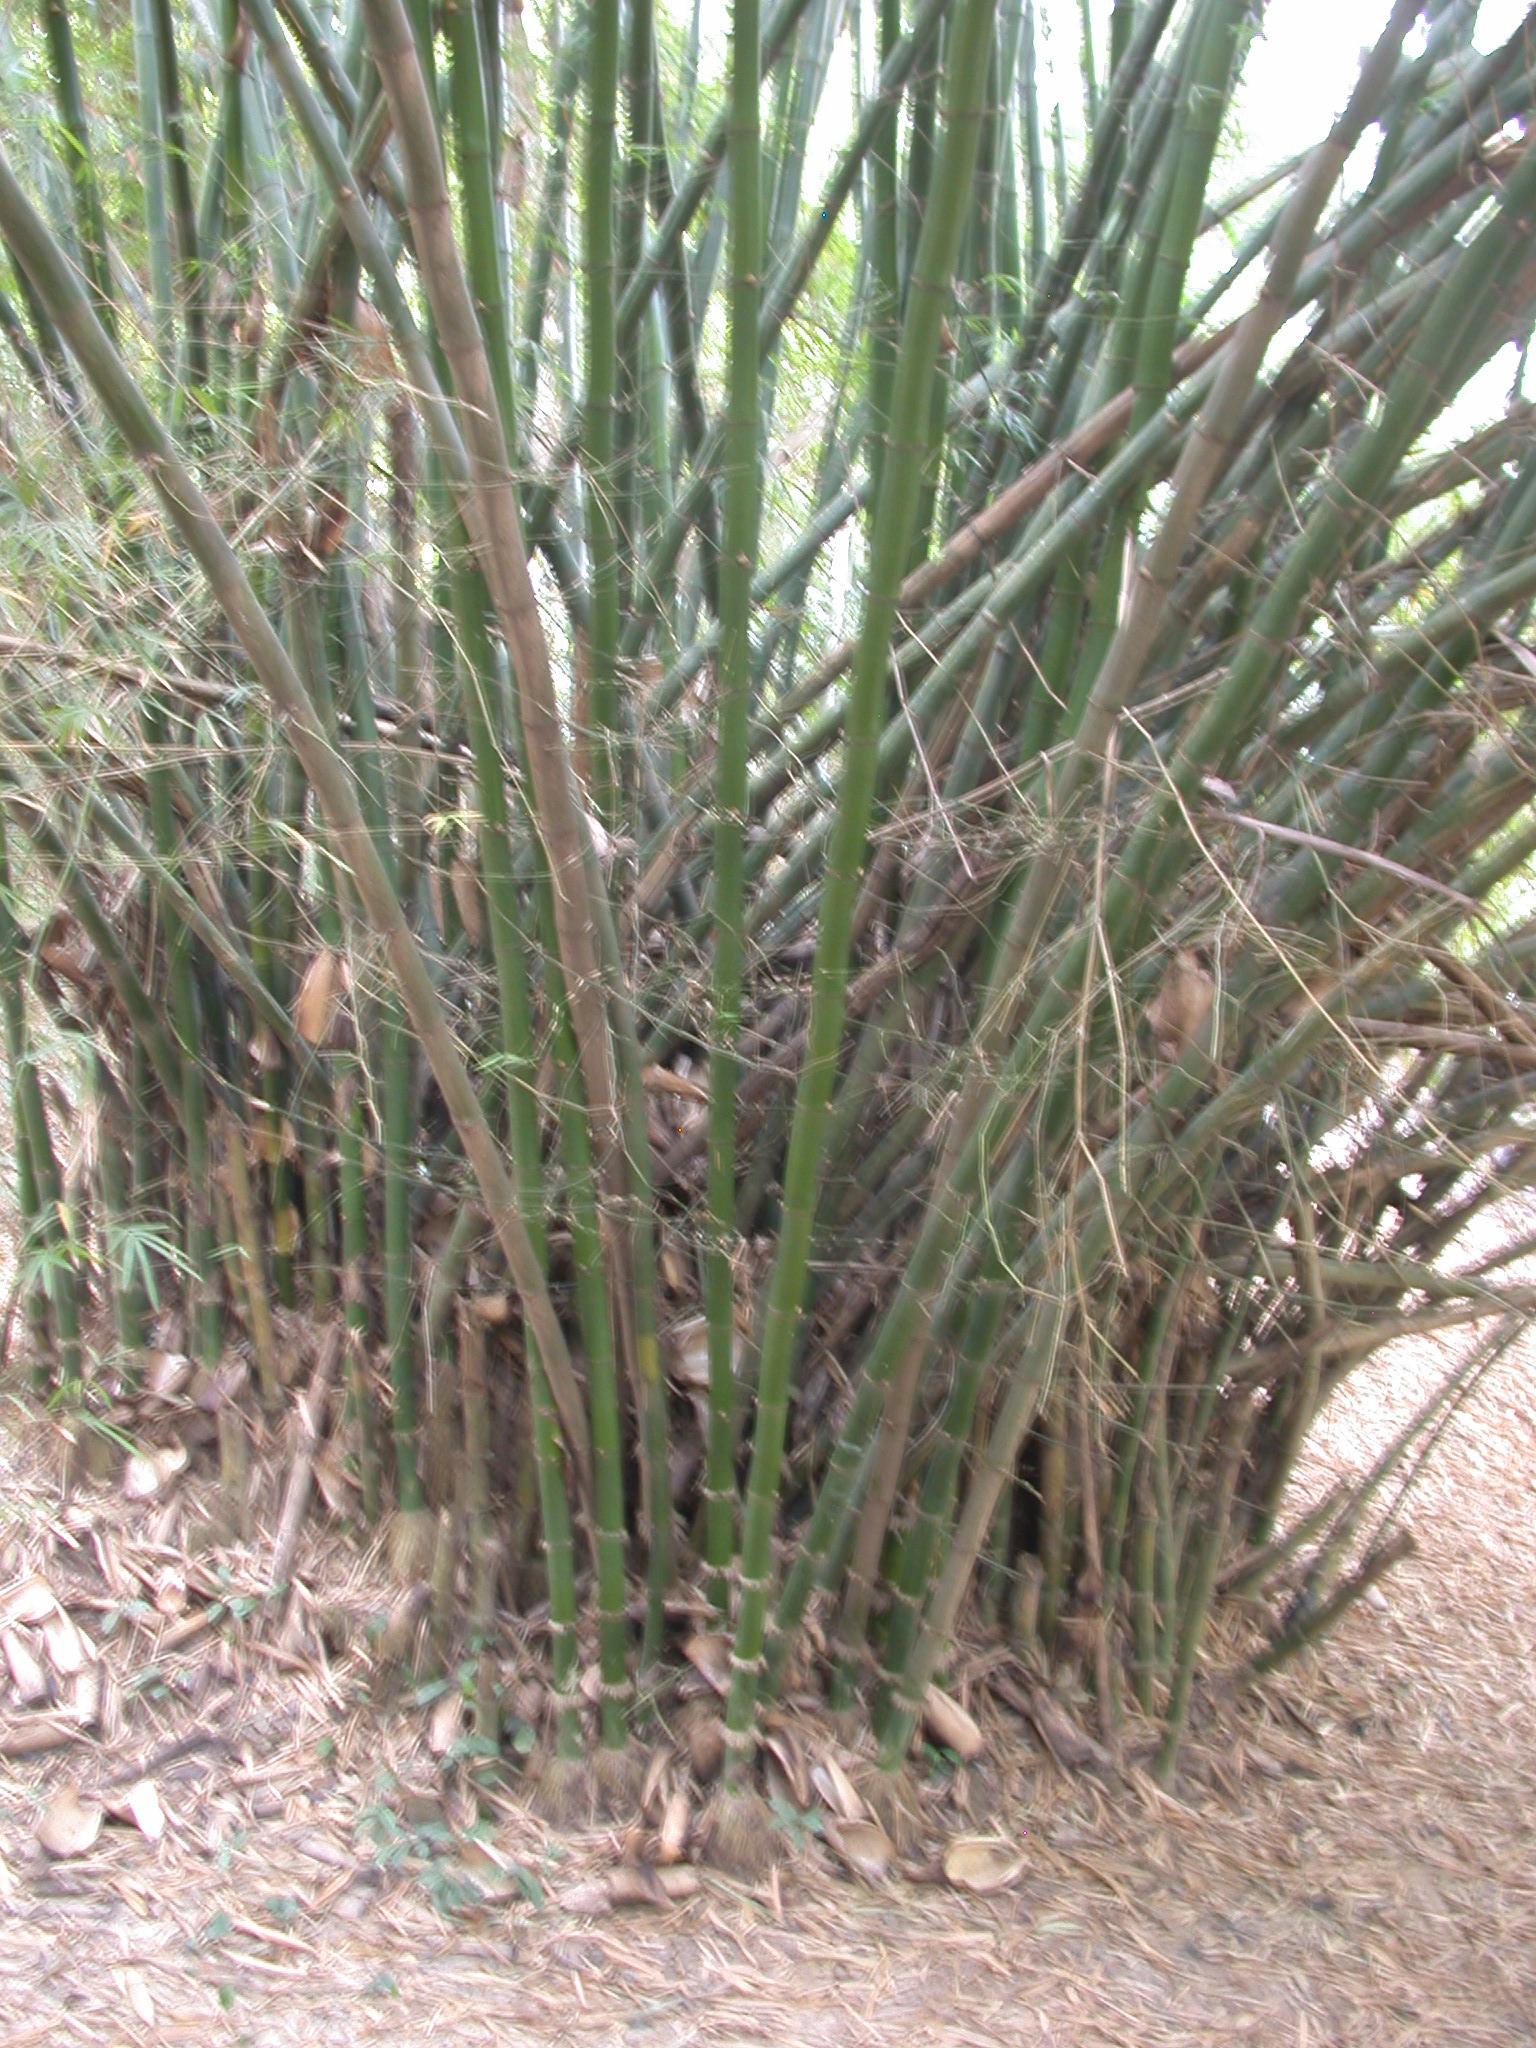 Bamboo Cluster by Osun River, Osun Sacred Grove, Oshogbo, Nigeria